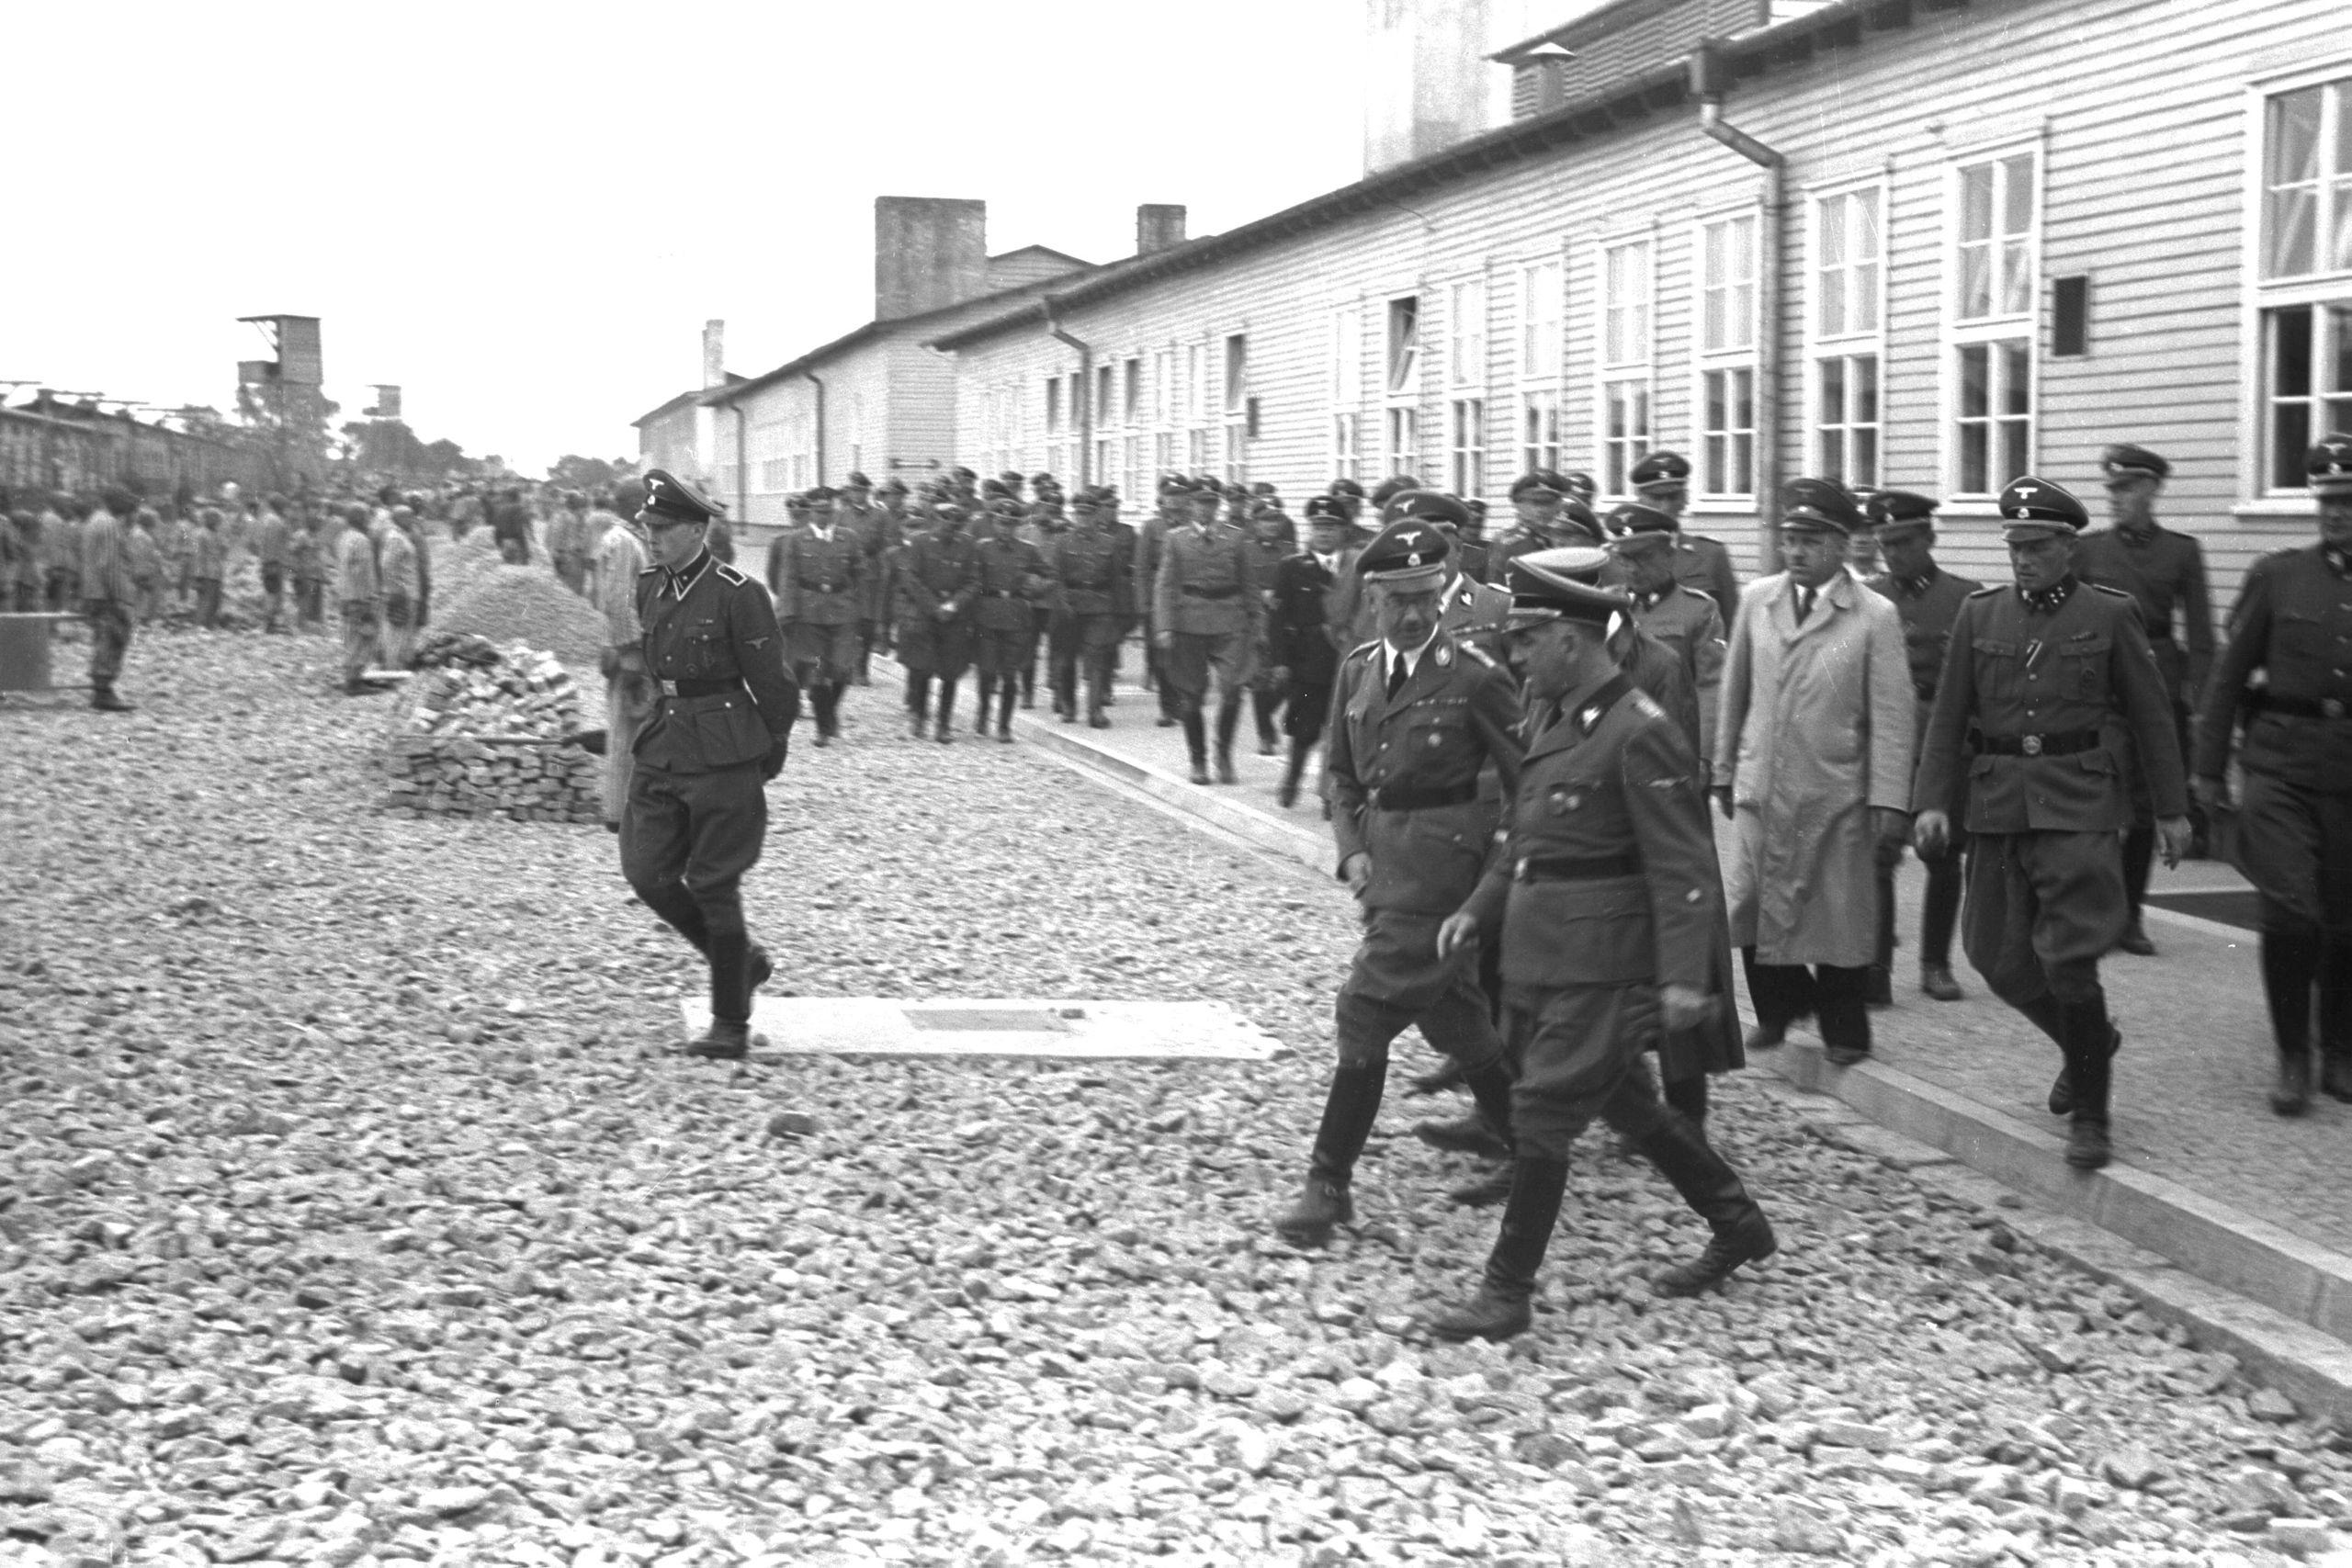 Visite d'inspection d'Himmler en 1941